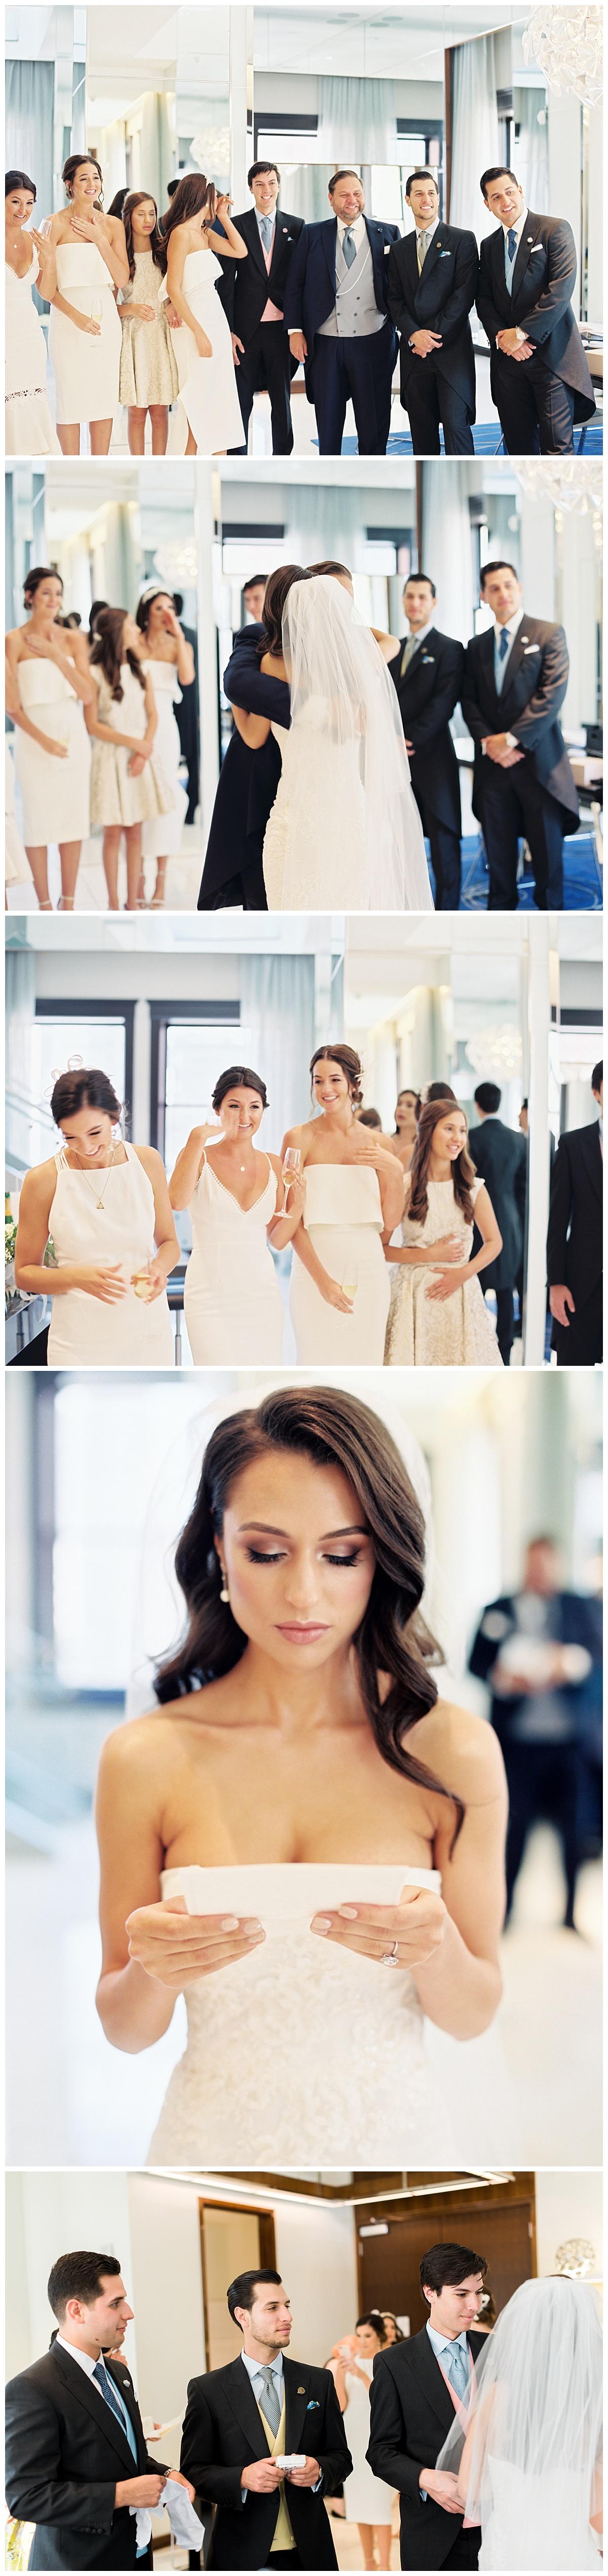 the-joule-dallas-wedding-ar-photography-3.jpg